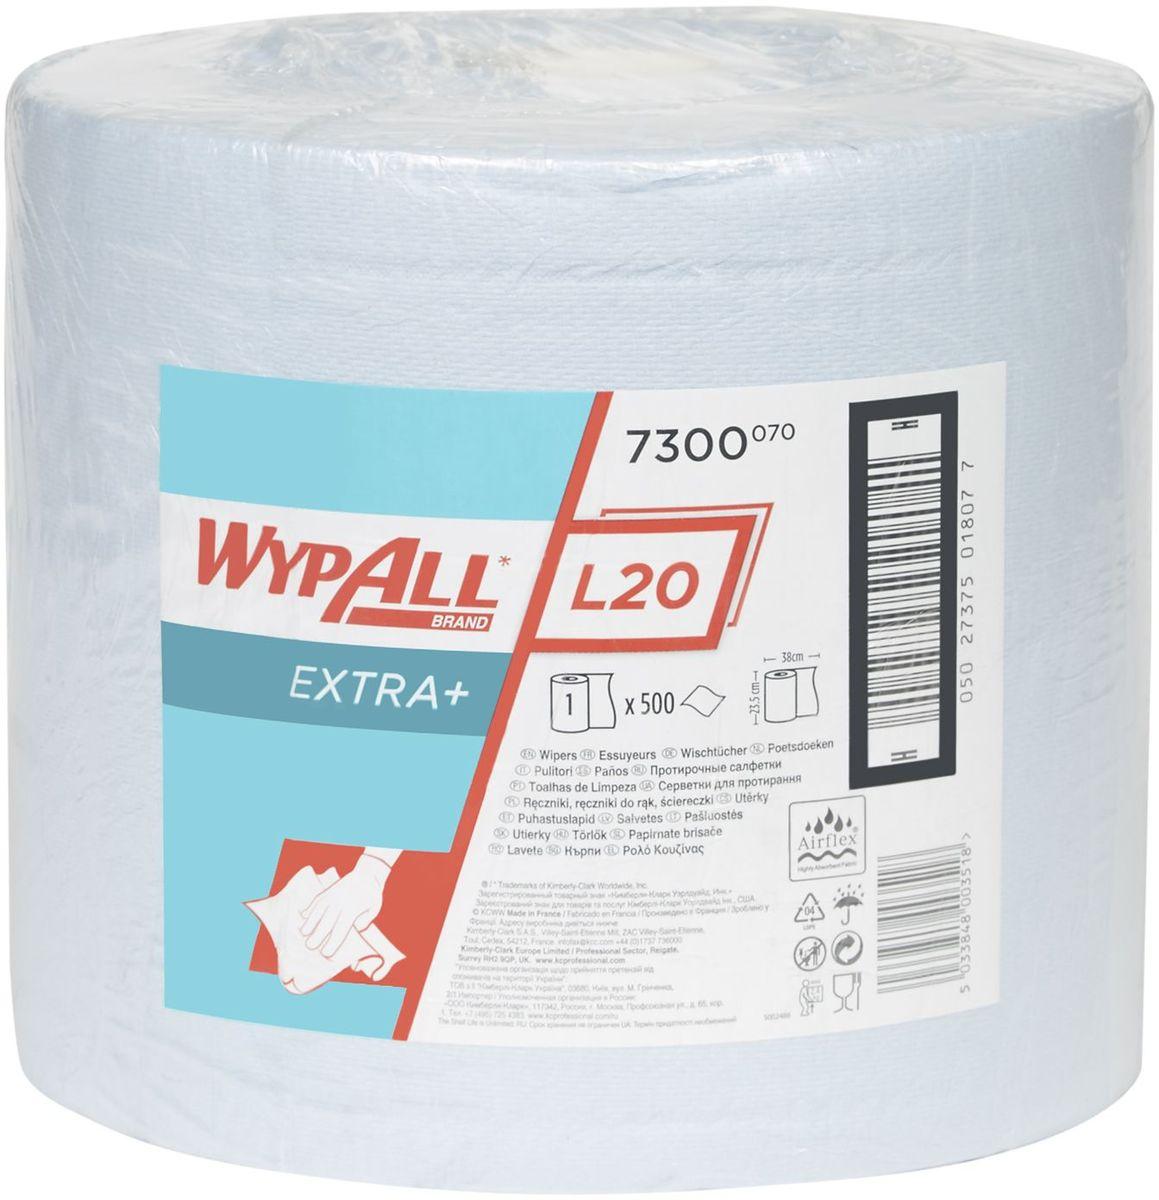 "Полотенца бумажные Wypall ""L30"", двухслойные, 500 шт. 7300"